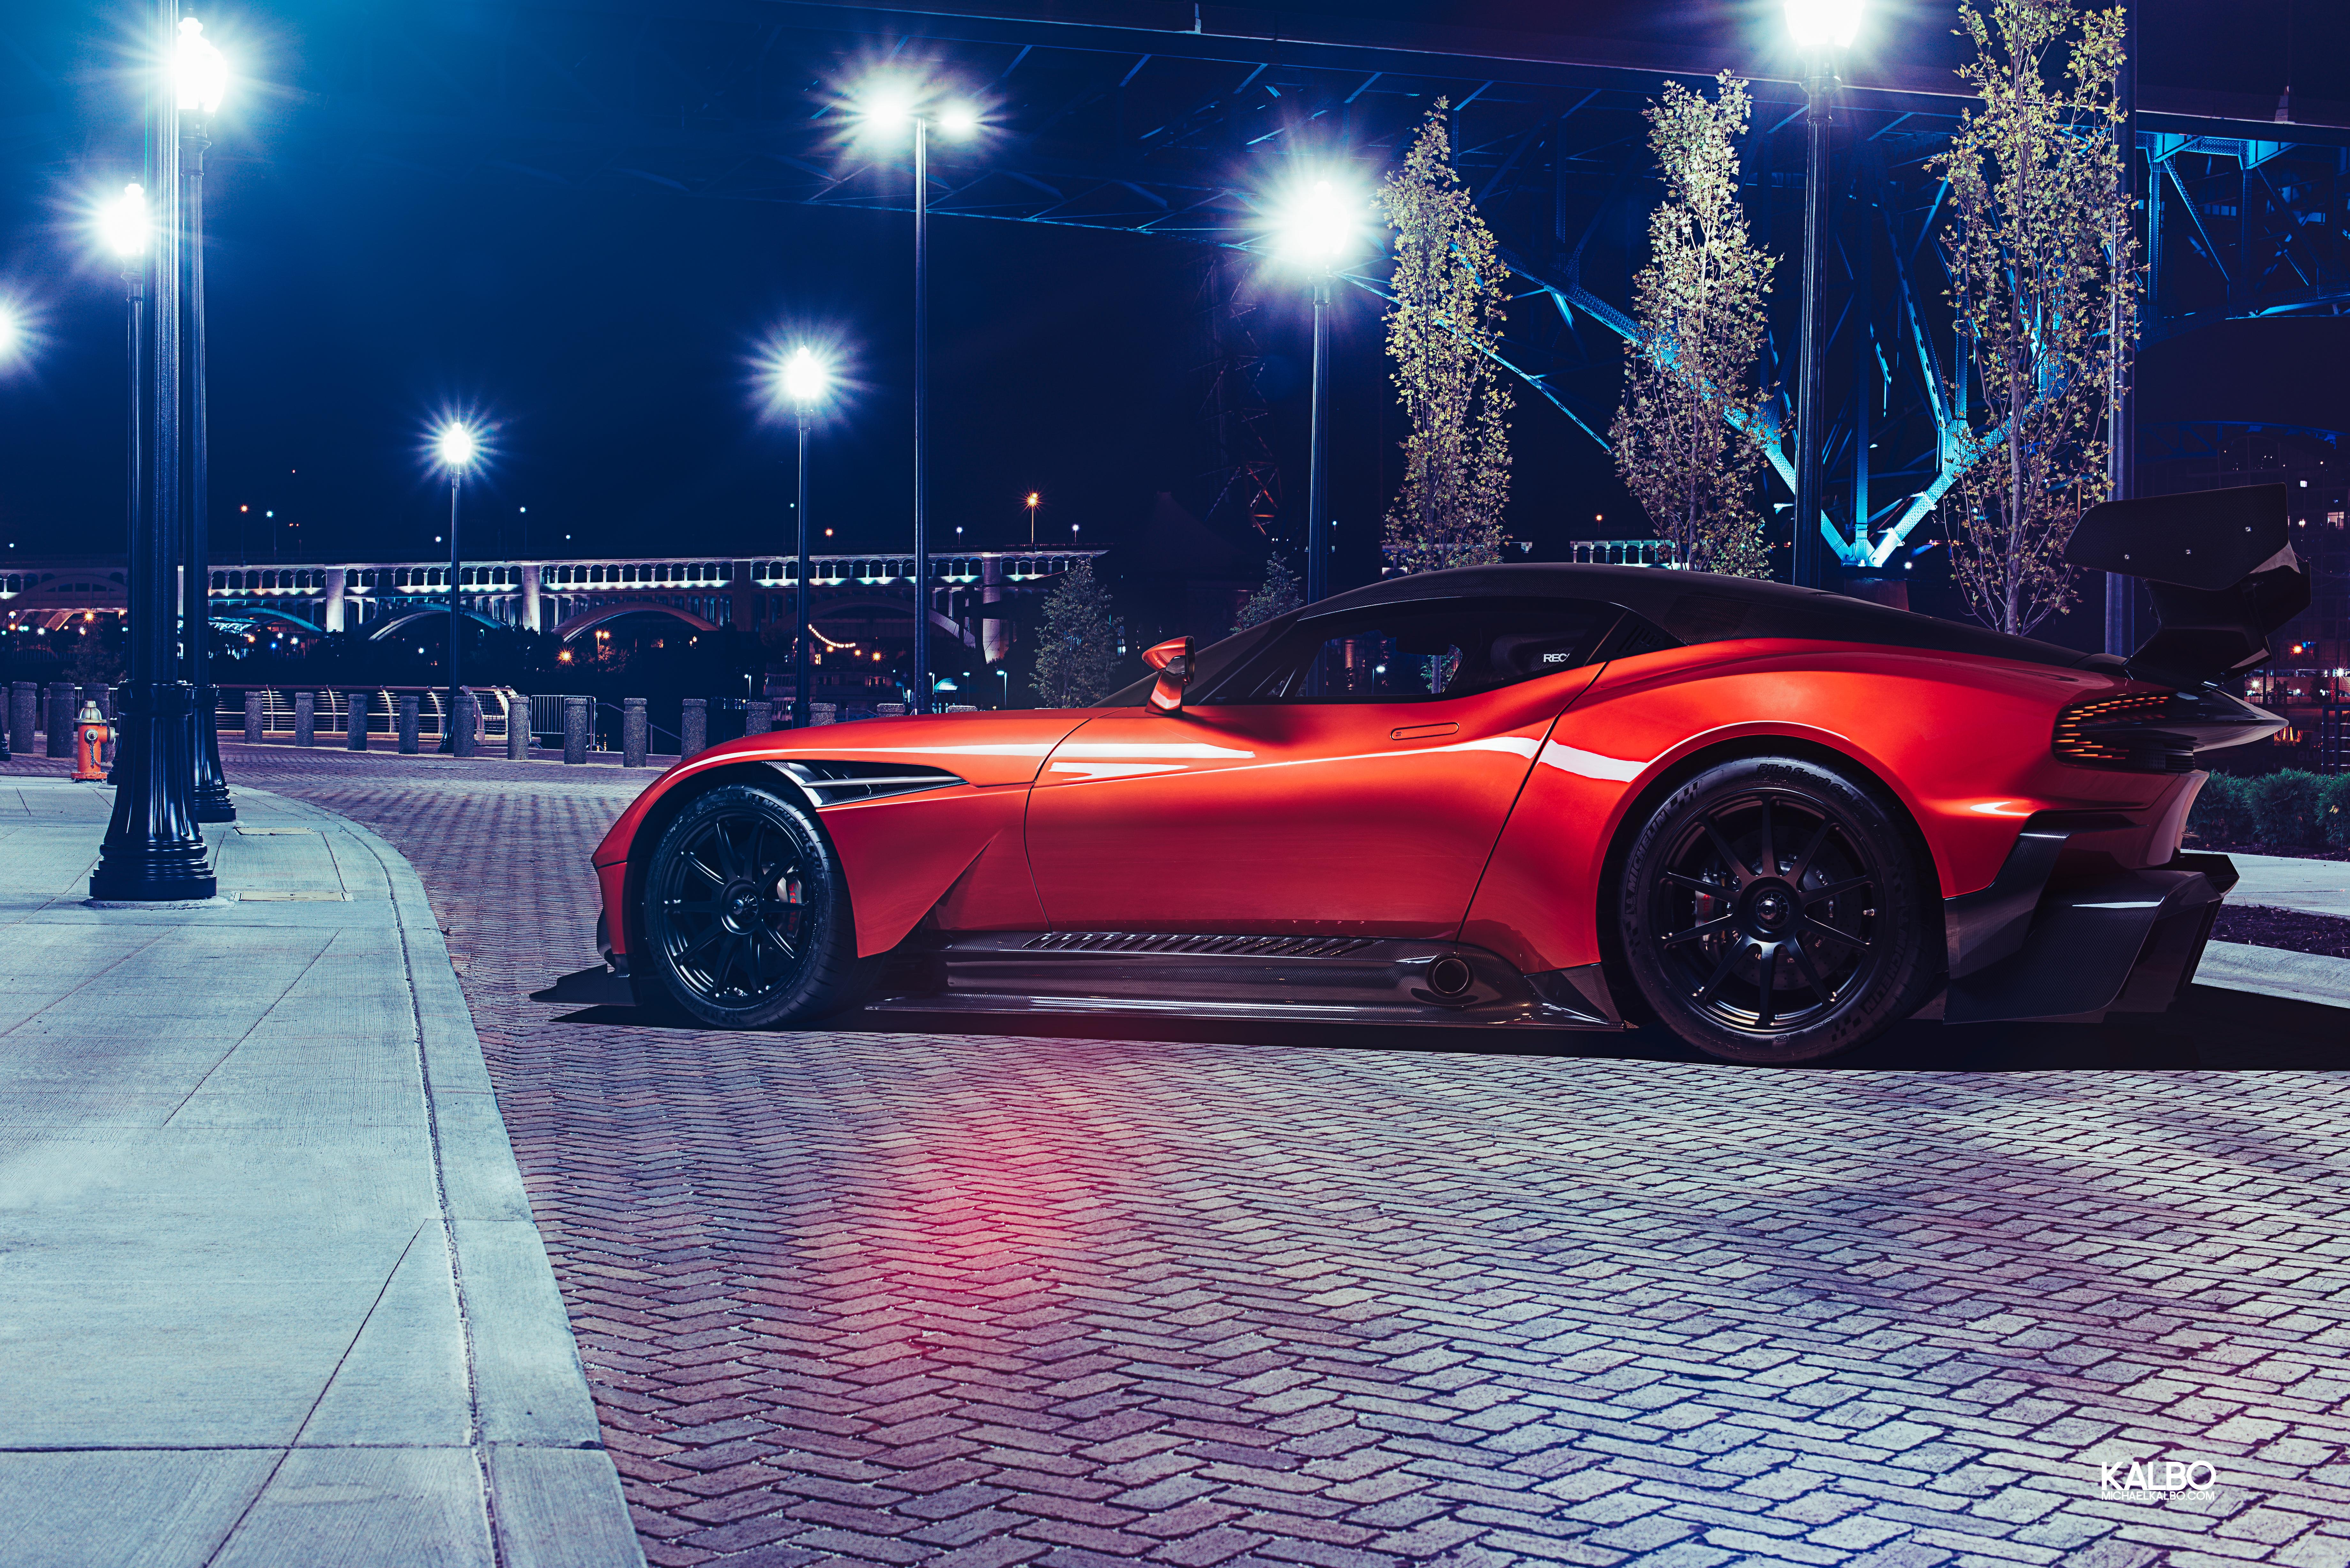 Aston-Martin-Vulcan-x-Michael-KALBO-1